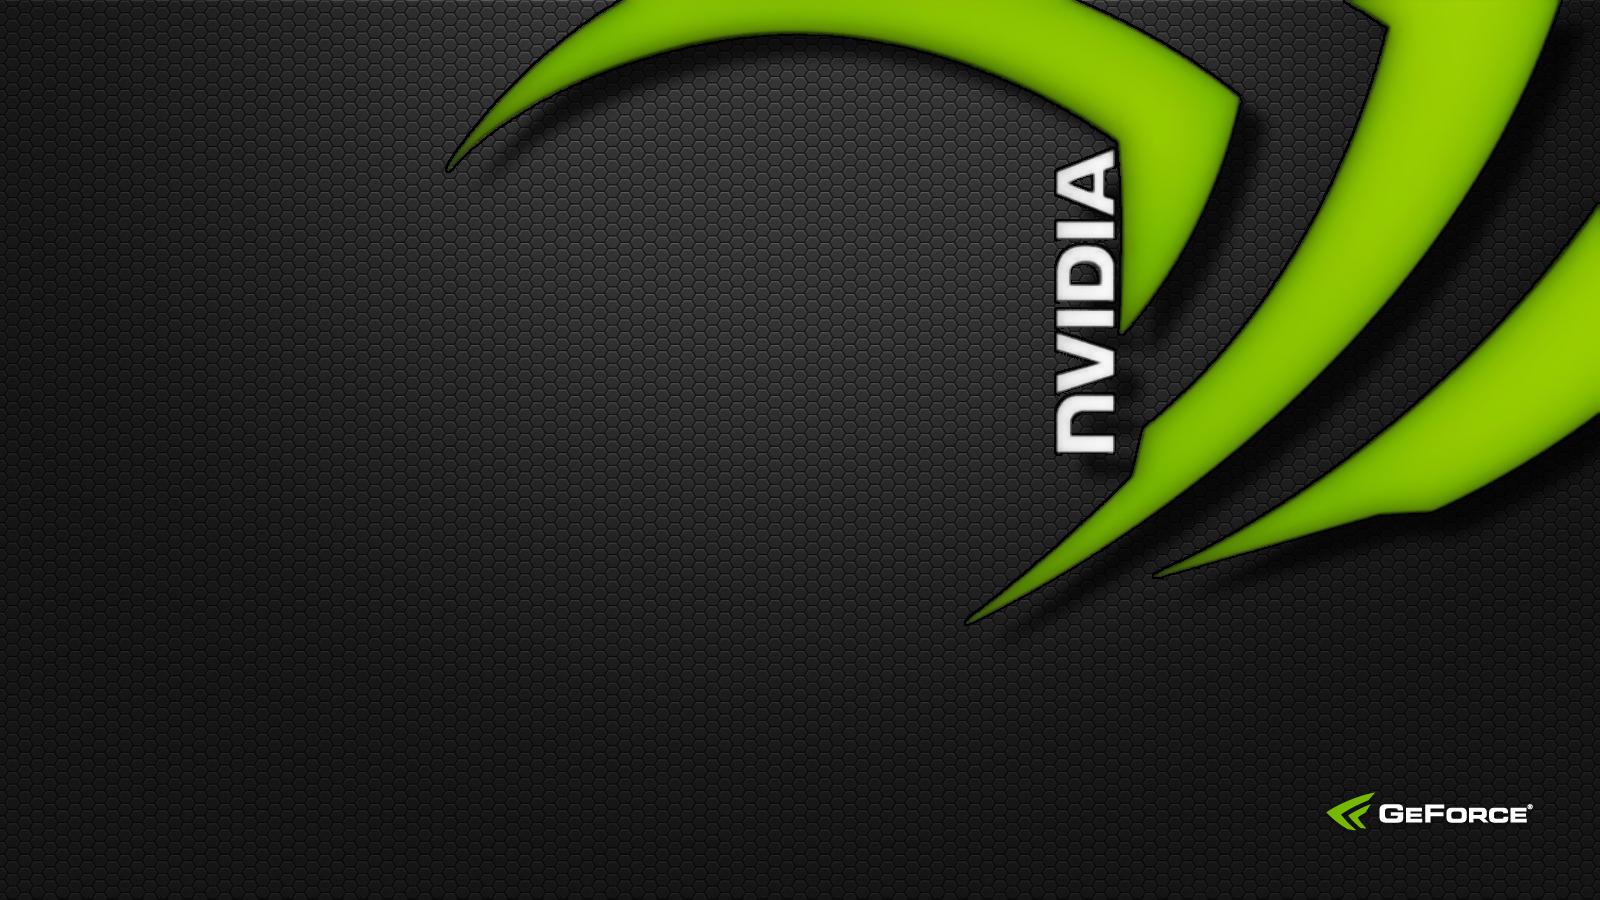 Nvidia Wallpaper | Wallpapers HD - 649.1KB